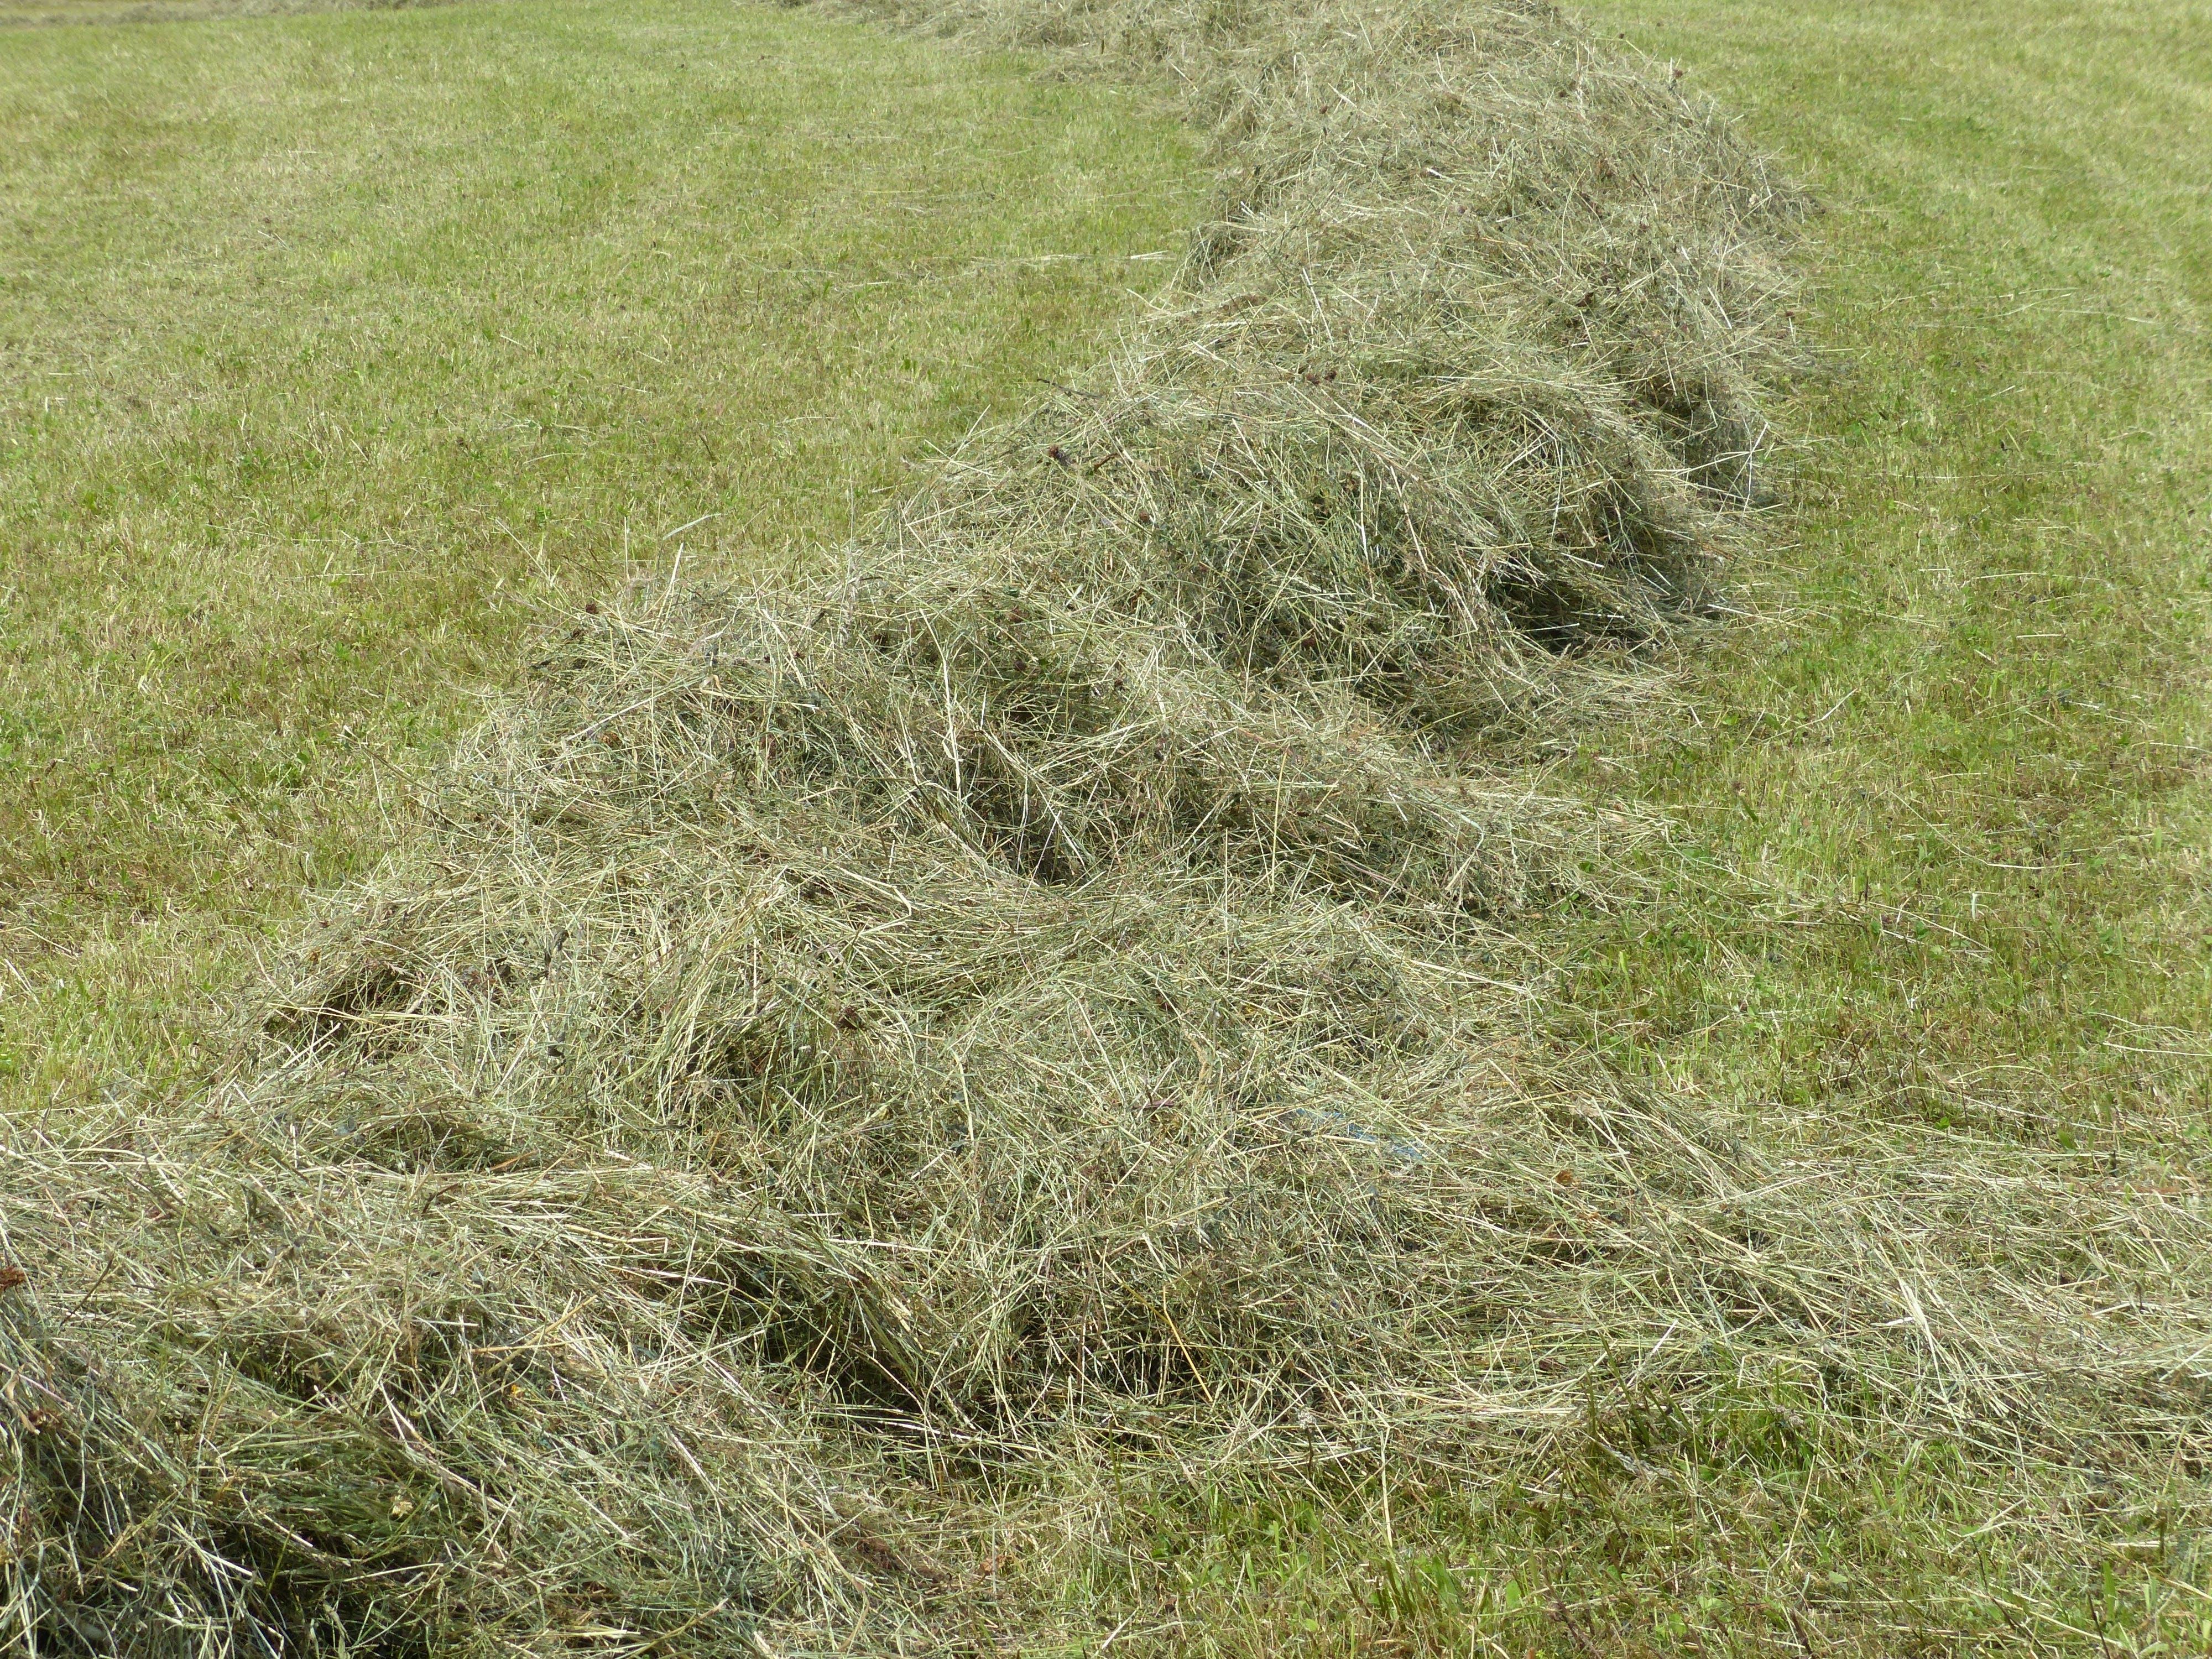 Free stock photo of contact, crop, forage, geschwadet